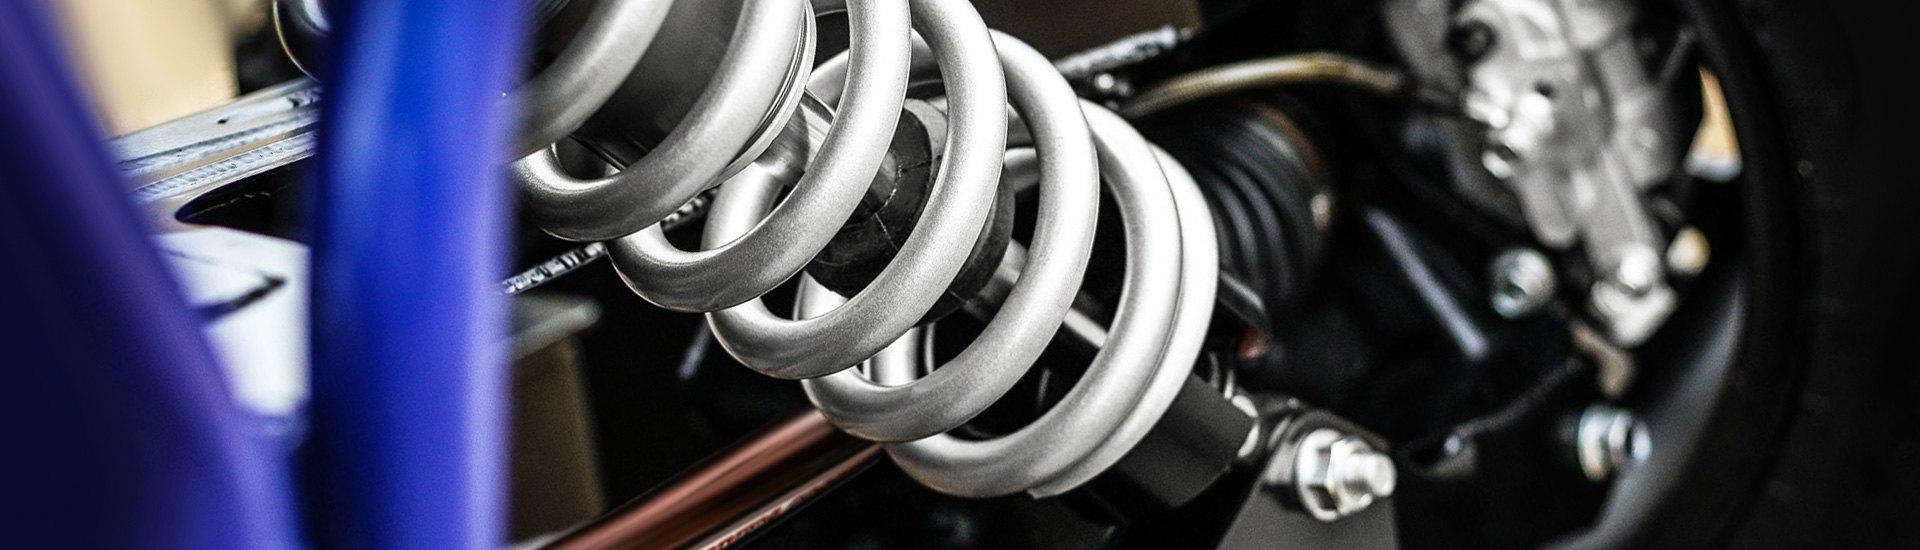 Rear Suspension Linkage Bearings and Seals Kit Yamaha YFZ350 Banshee 1987 1988 1989 1990 1991 1992 1993 1994 1995 1996 1997 1998 1999 2000 2001 2002 2003 2004